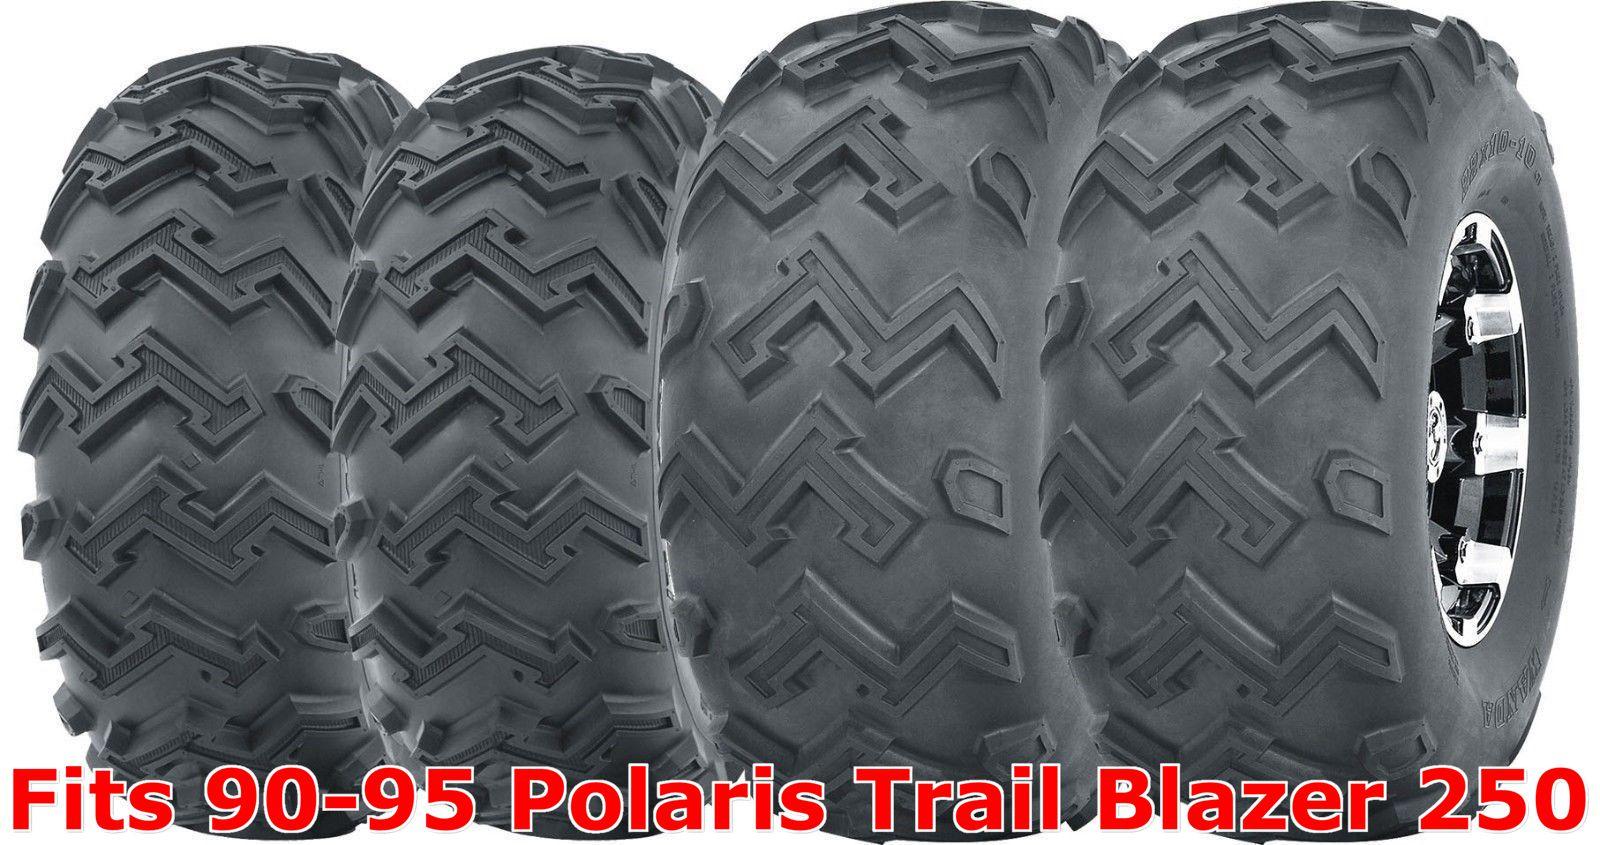 Full set WANDA ATV tires 23x7-10 front /& 22x11-10 rear 94-98 Polaris Sport 400L